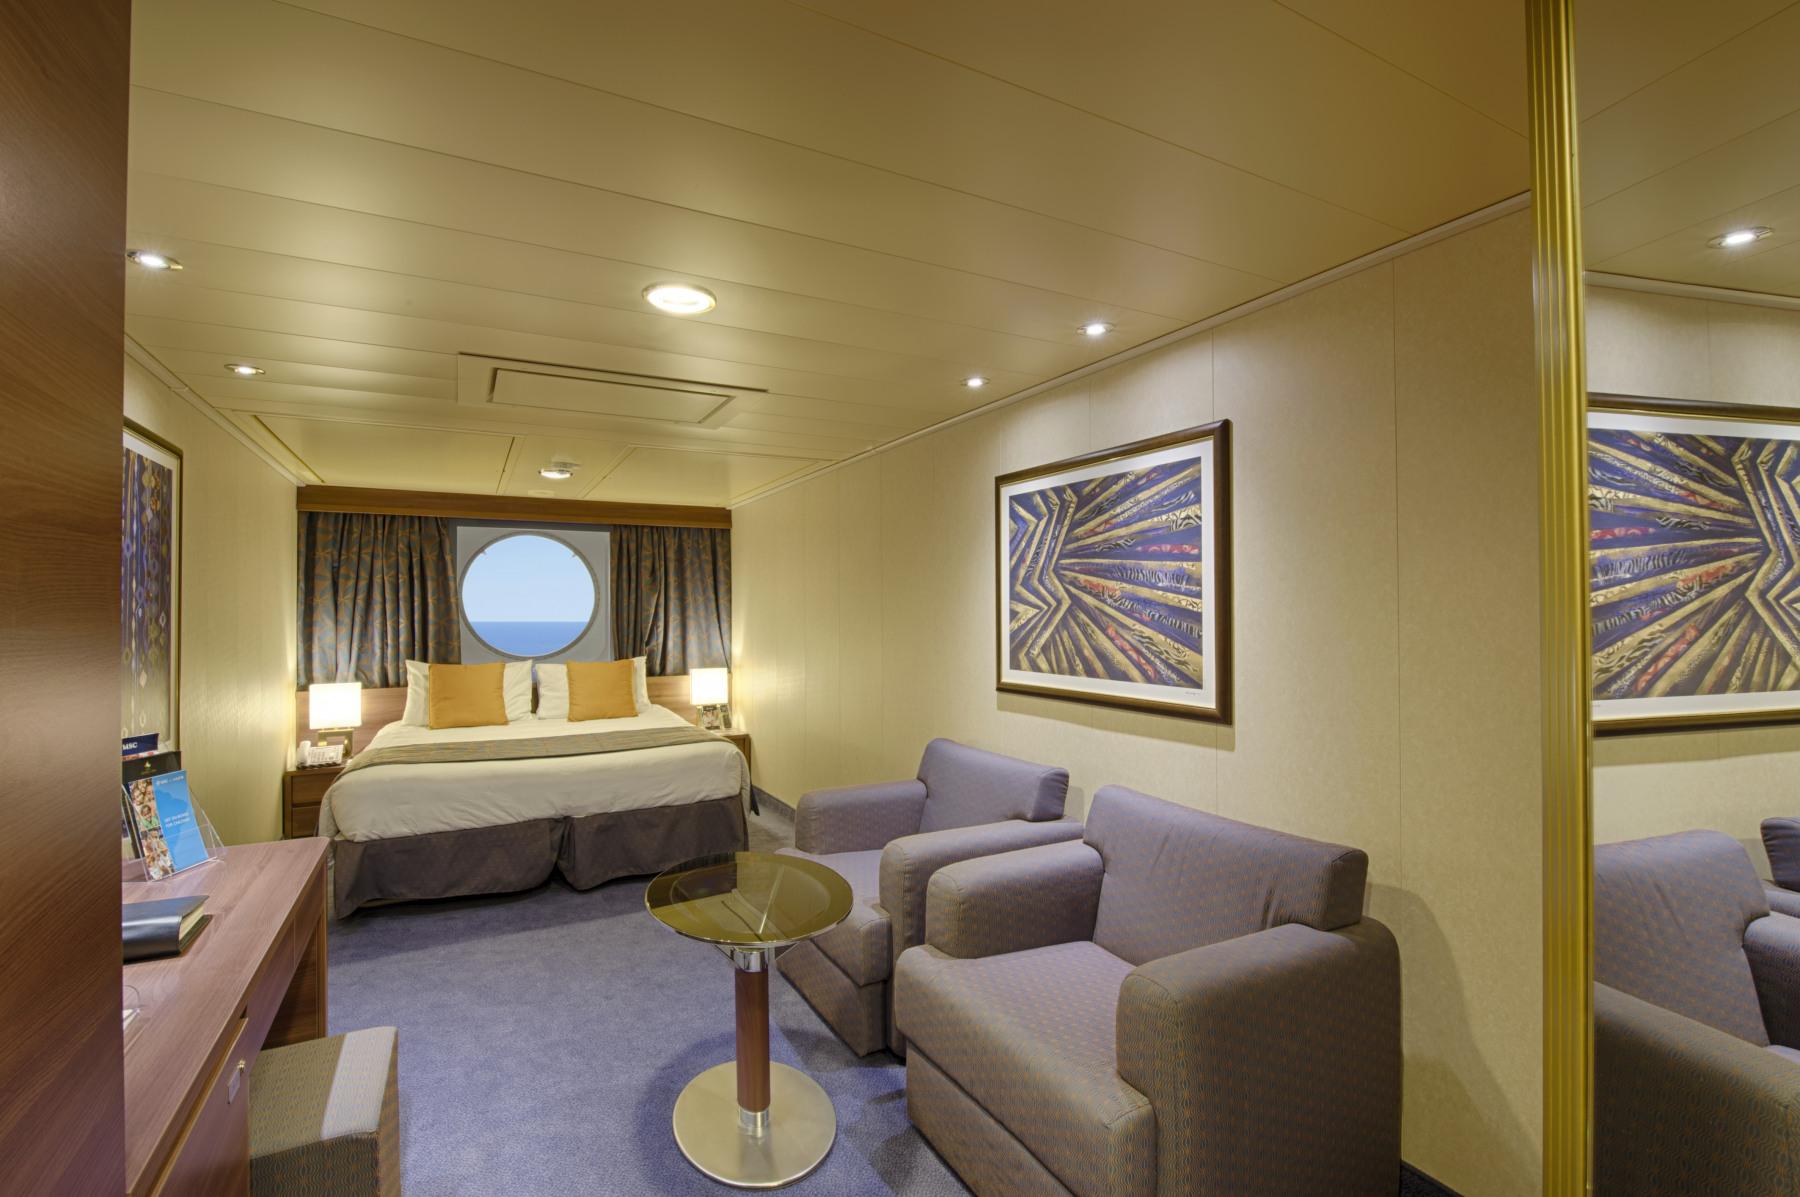 MSC Fantasia Class Ocean View.jpg